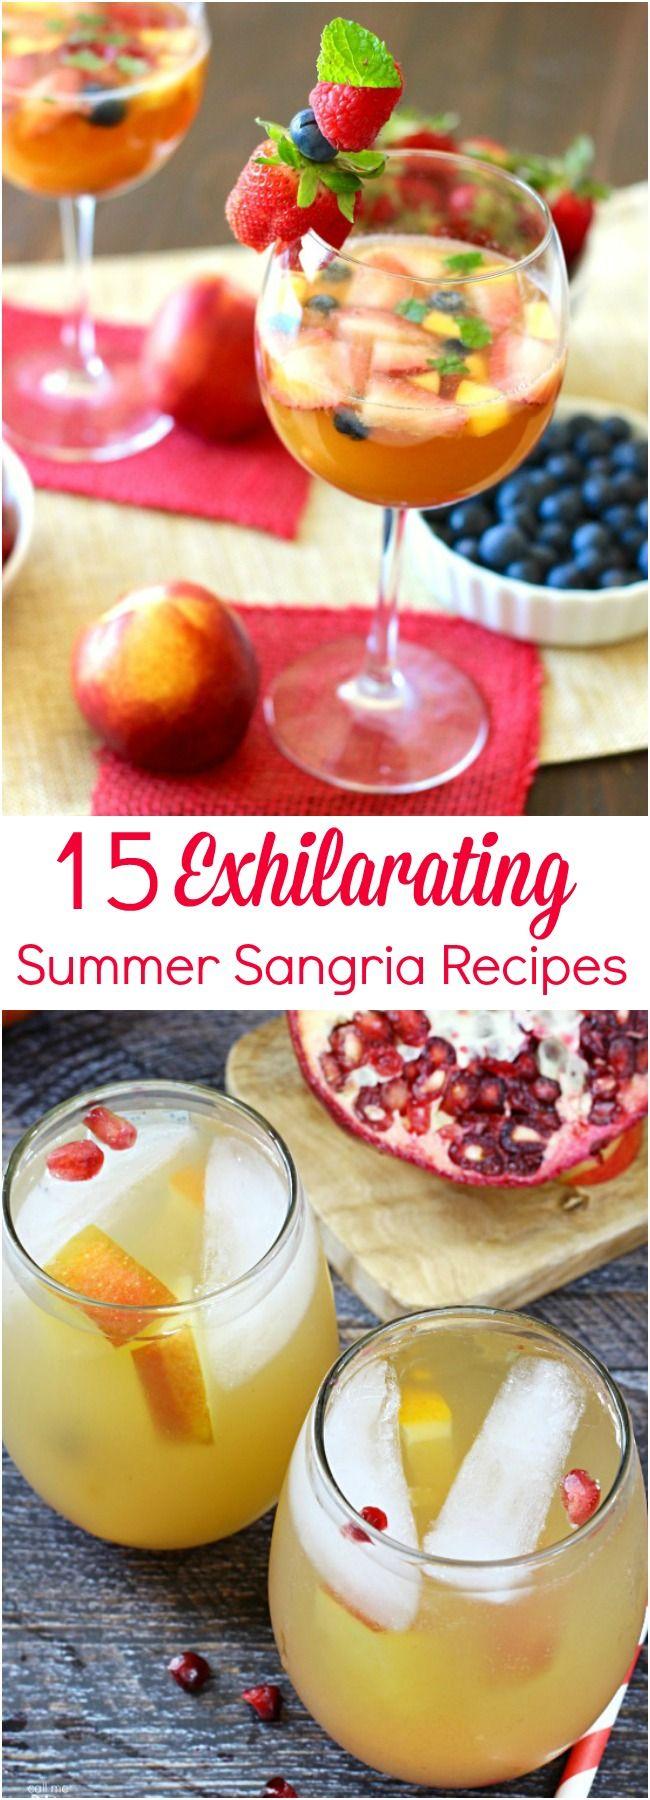 15 Exhilarating Summer Sangria Recipes